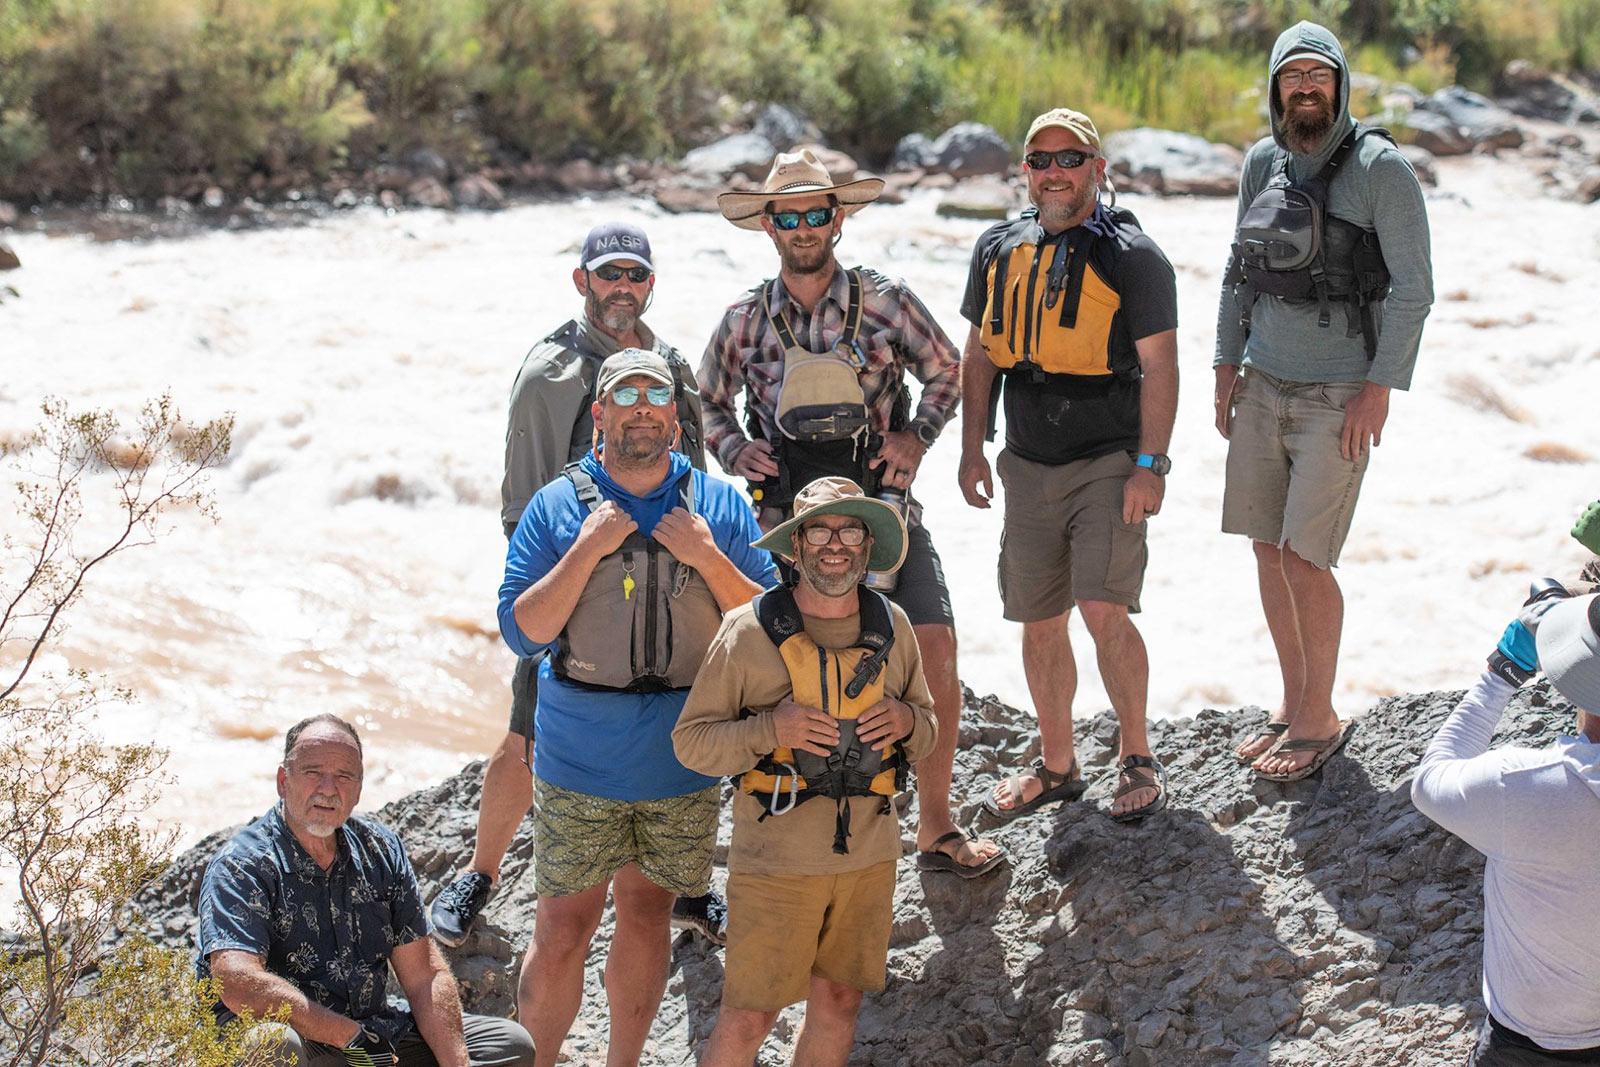 Adam Schallau, Grand Canyon, Colorado River, Rapids, Boatman, photo